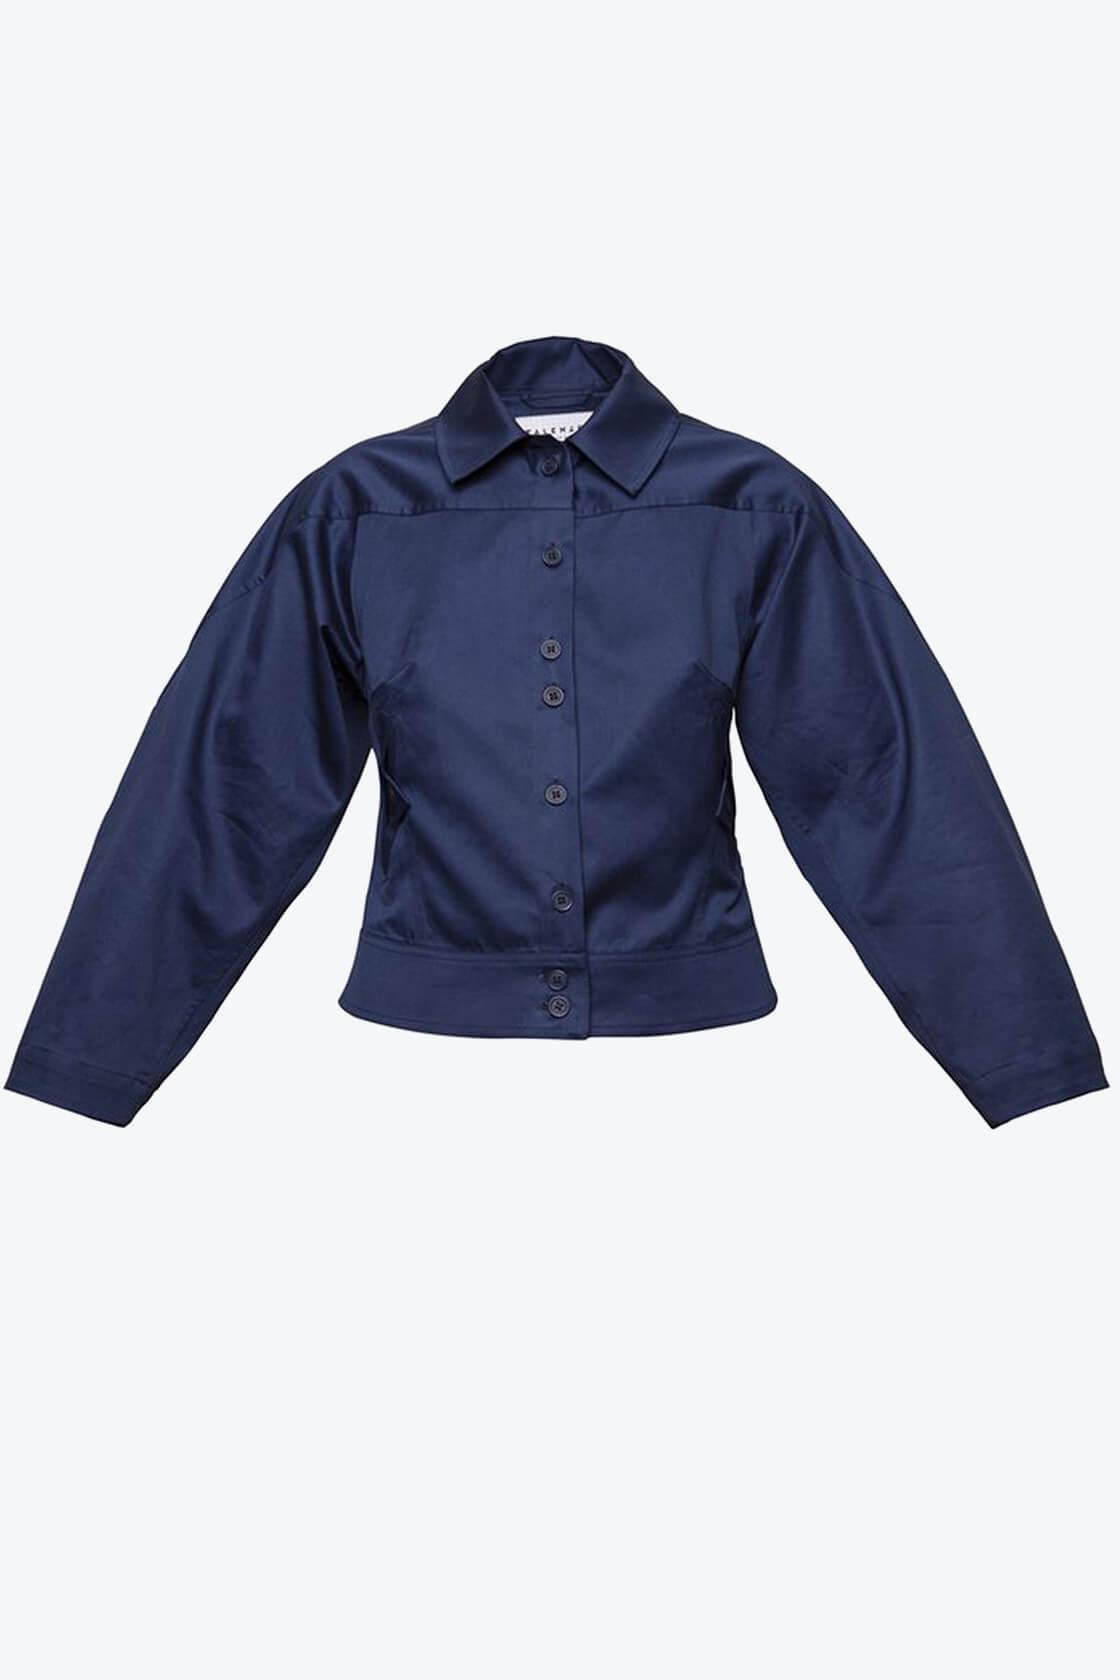 OL10000220 Wide sleeve jacket navy blue1